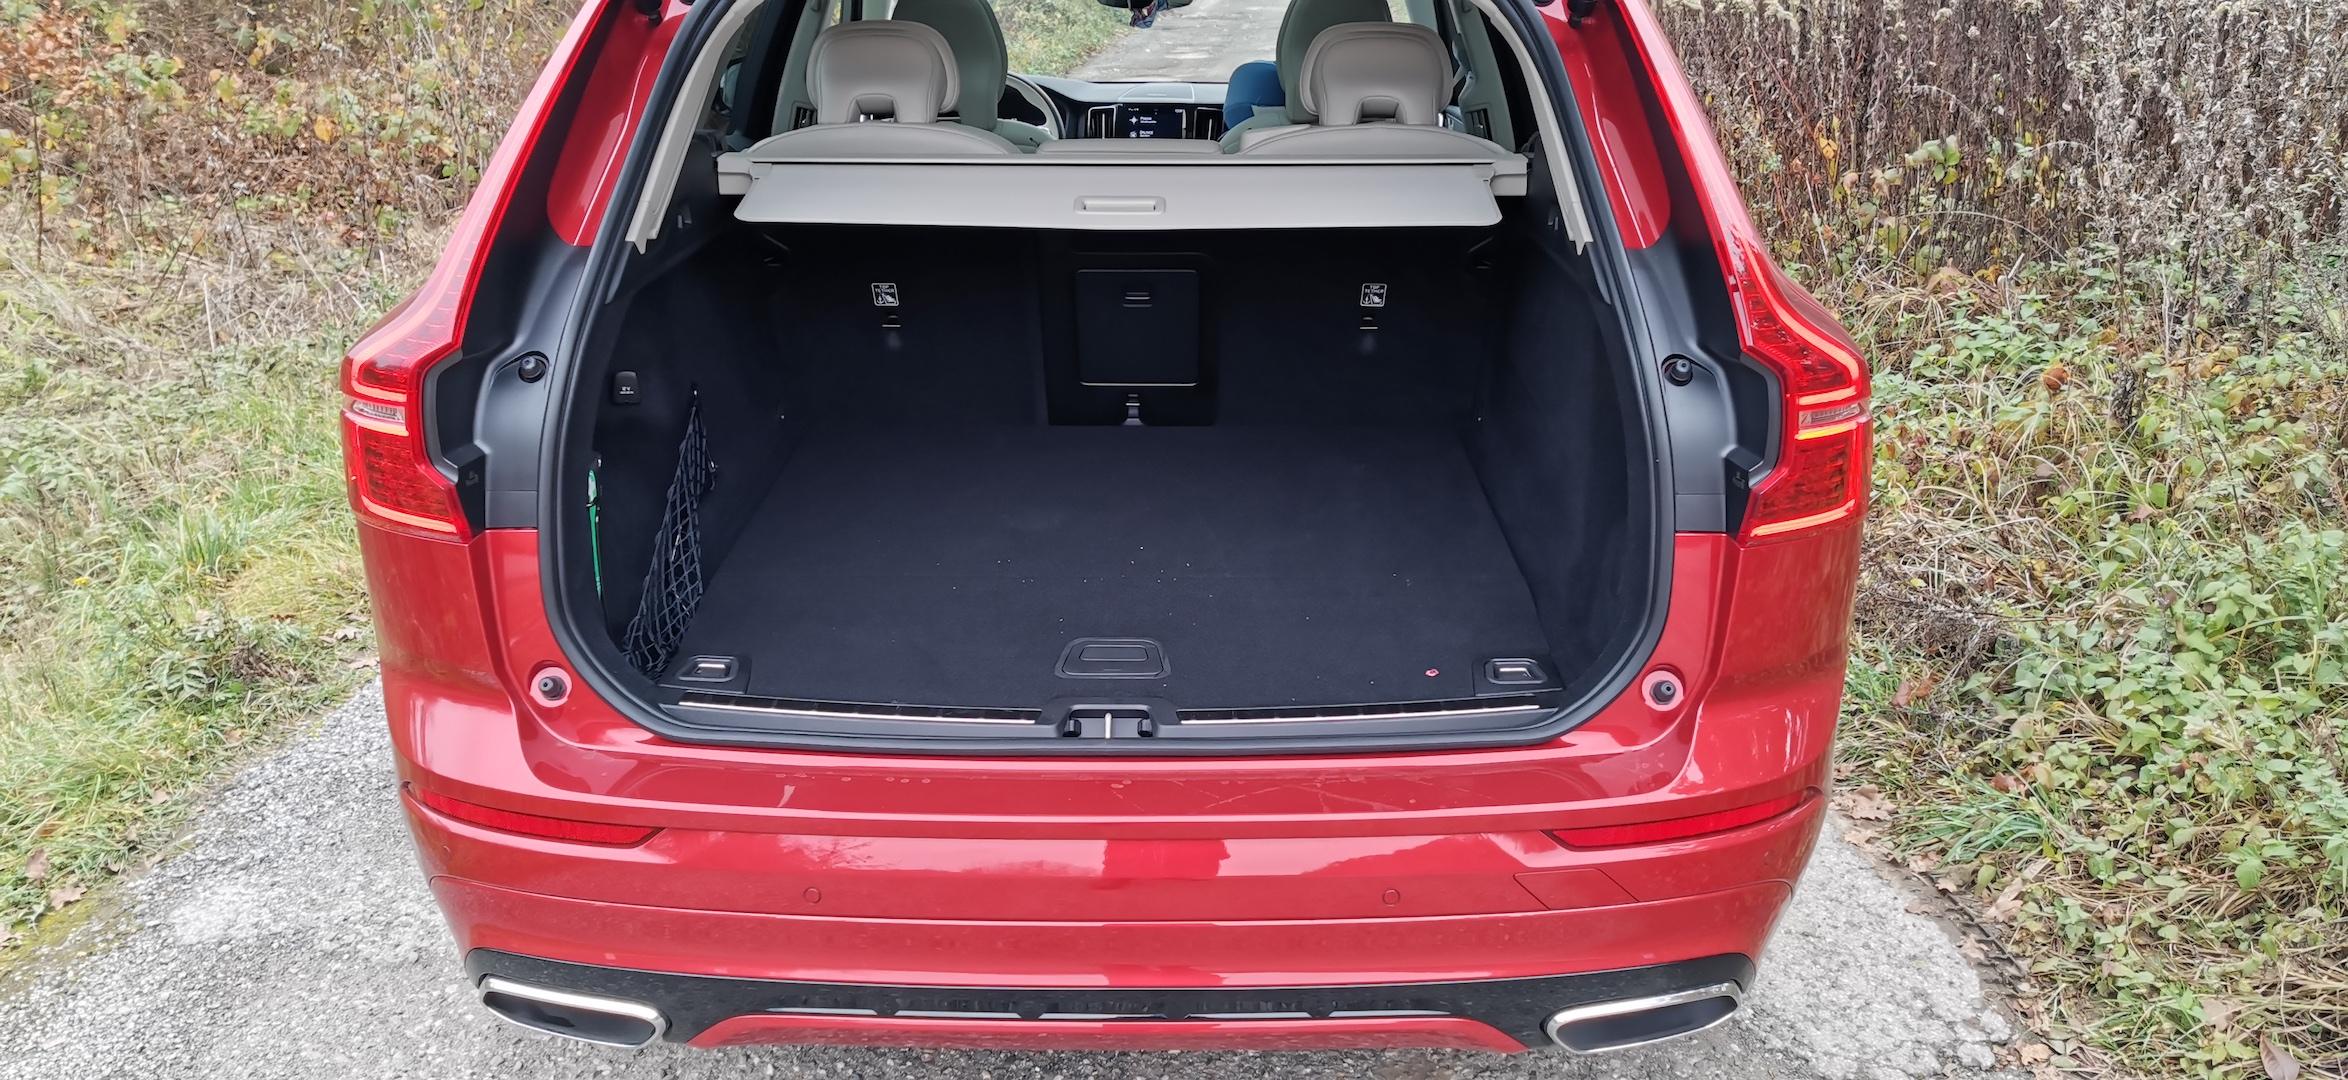 Volvo XC60 T6 AWD Recharge - zavazadlový prostor